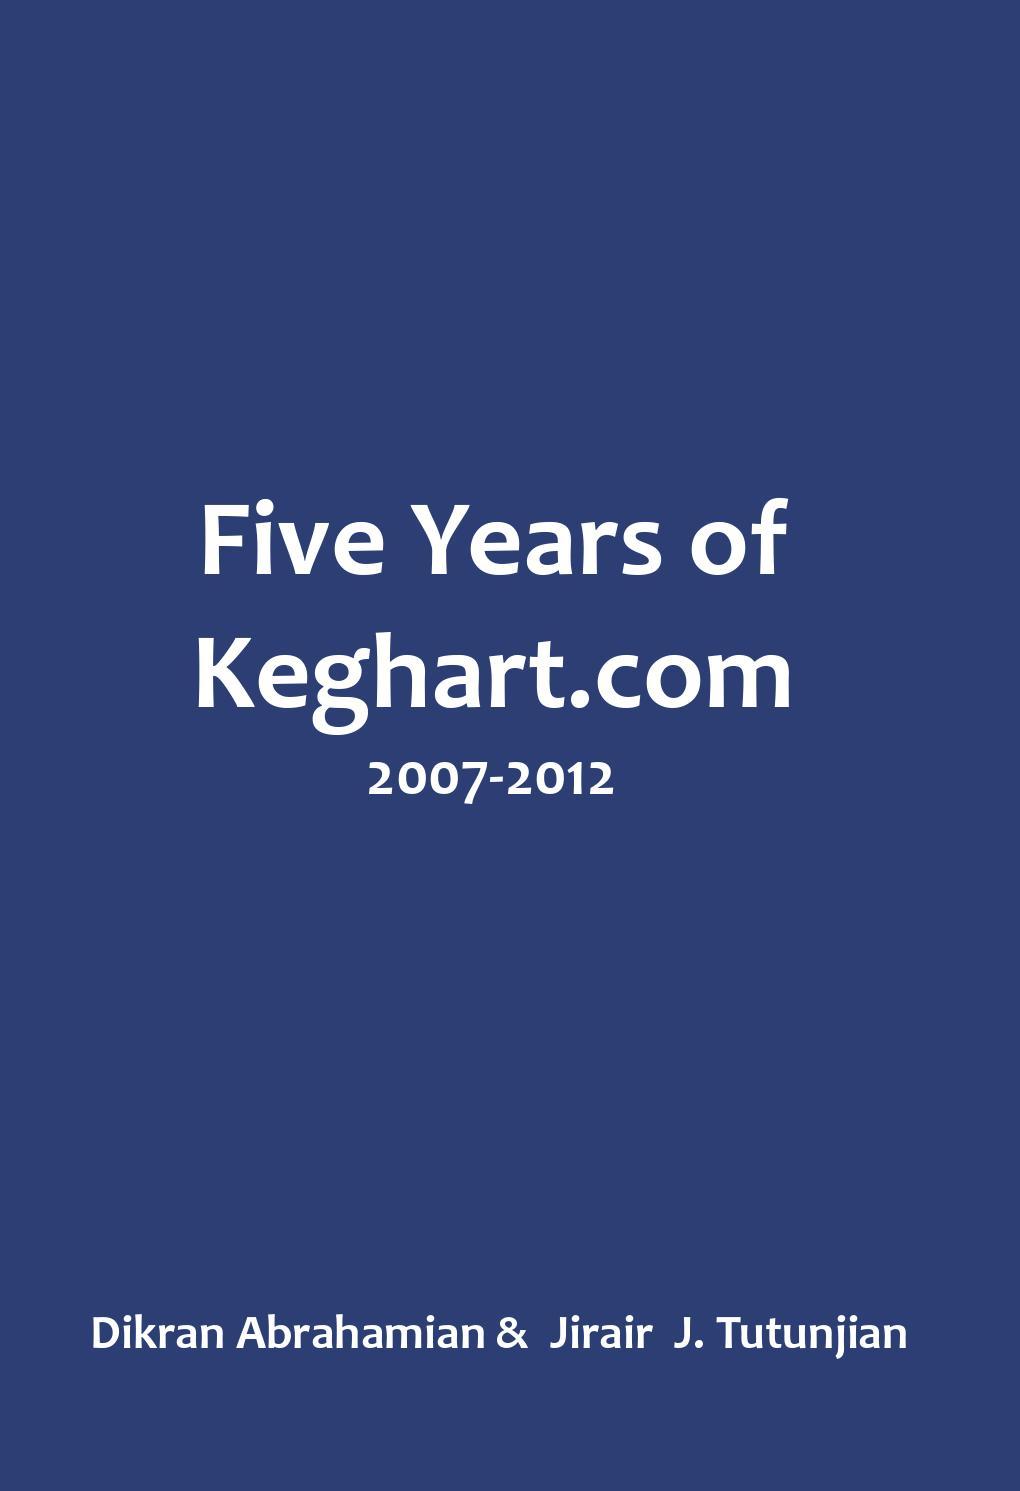 Five Years Of Keghart By Dikran Abrahamian Issuu